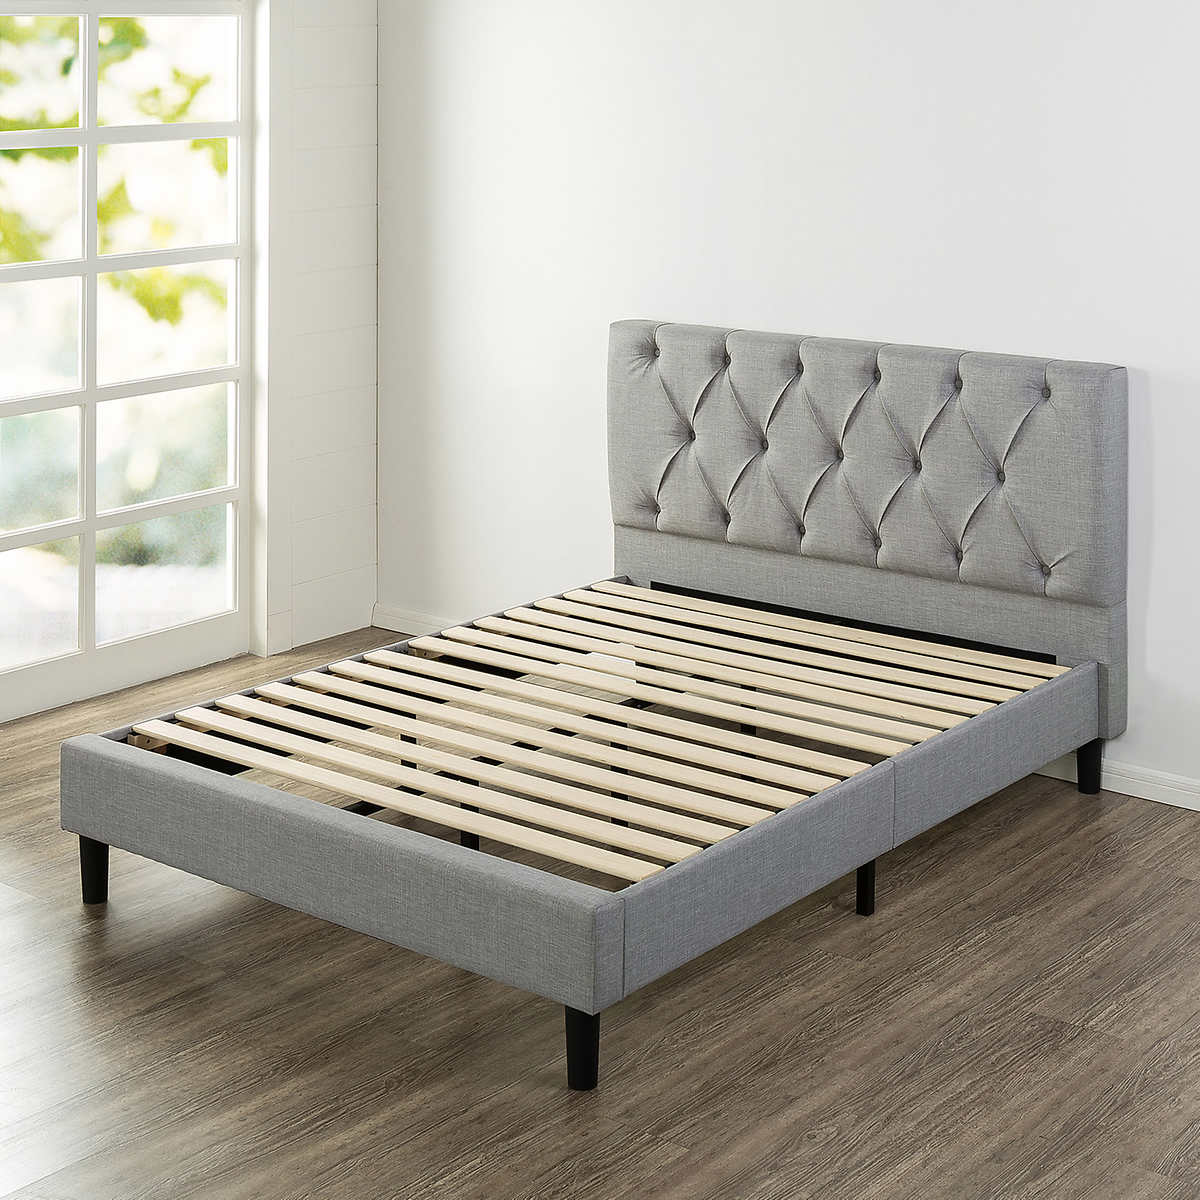 Blackstone Grand Upholstered Diamond Tufted Platform Bed Full